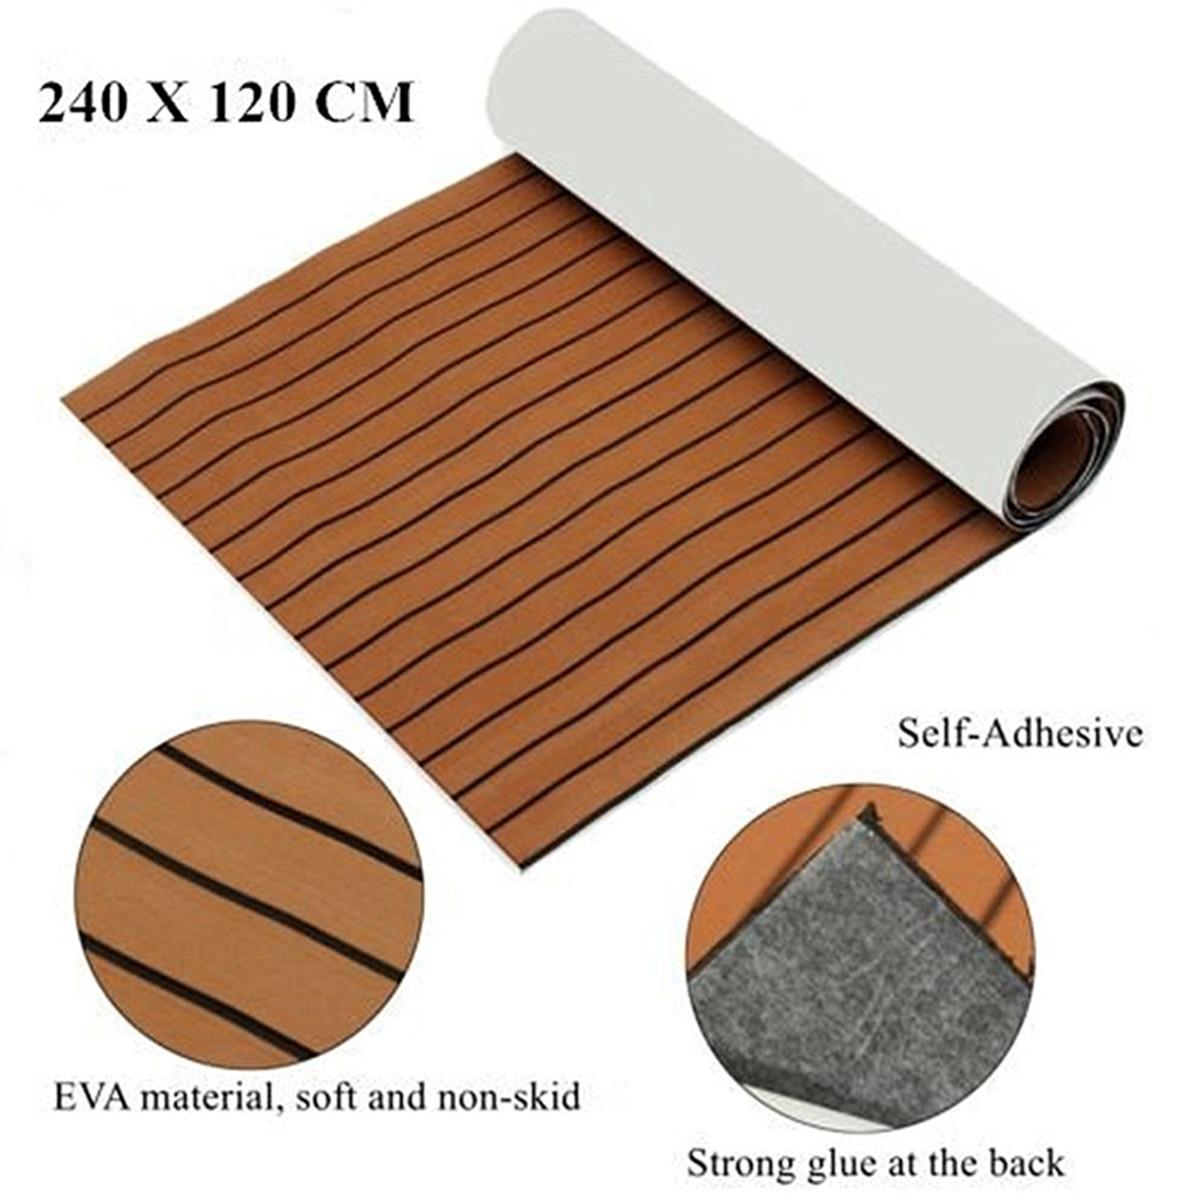 91/'/'x35.4/'x/'0.24/'/'Flooring Teak EVA Foam Boat Decking Sheet Marine Faux Brown